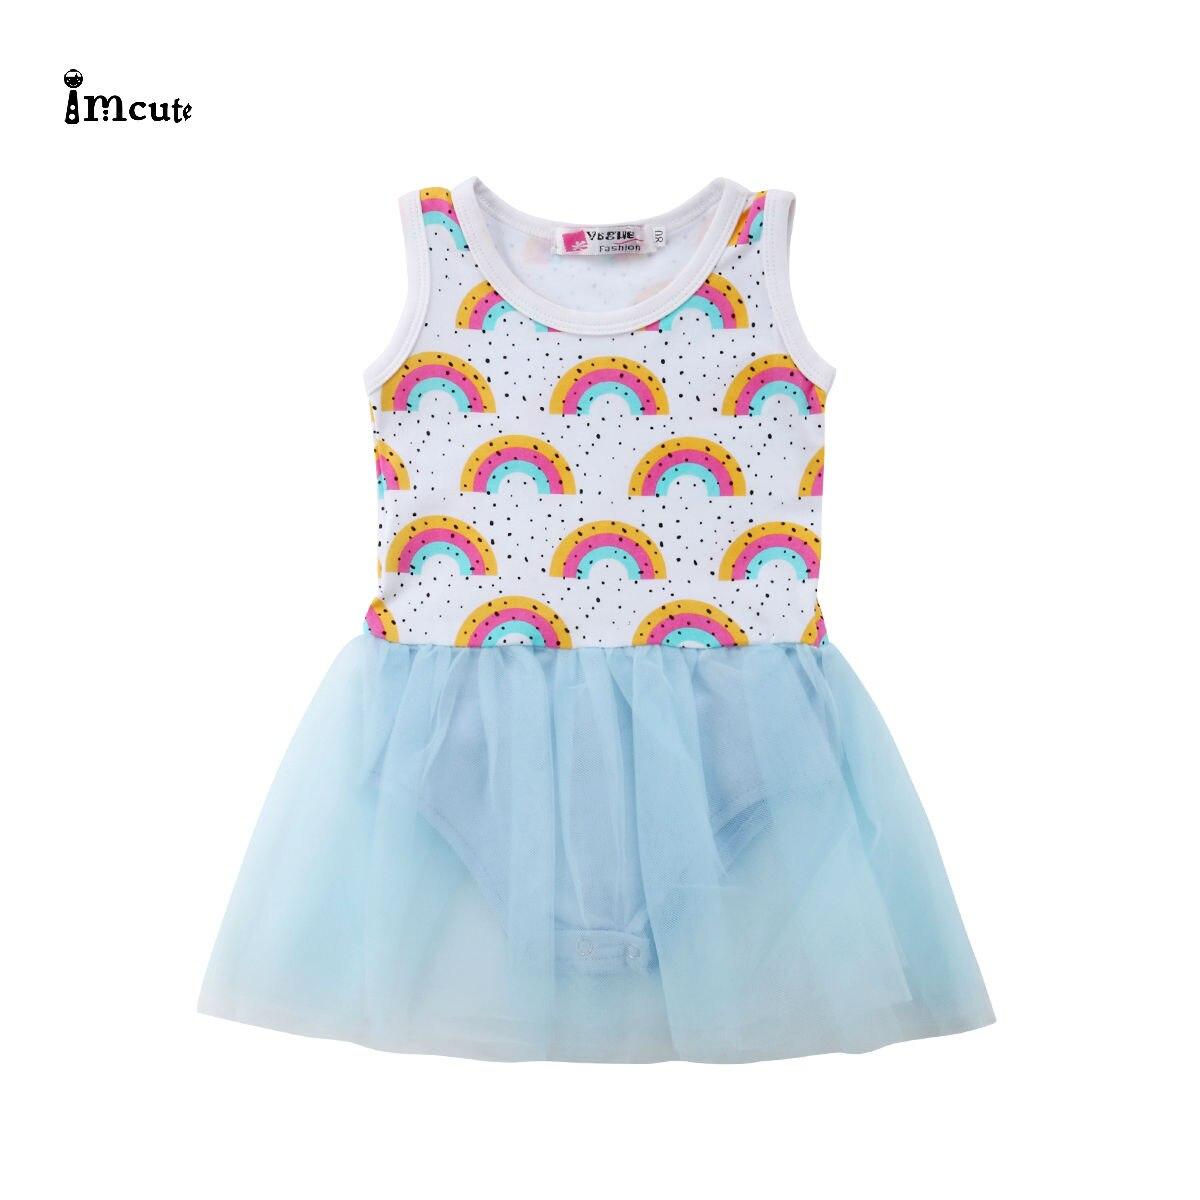 US Toddler Kids Baby Girl Lace Rainbow Party Pageant Tutu Dress Chiffon Sundress